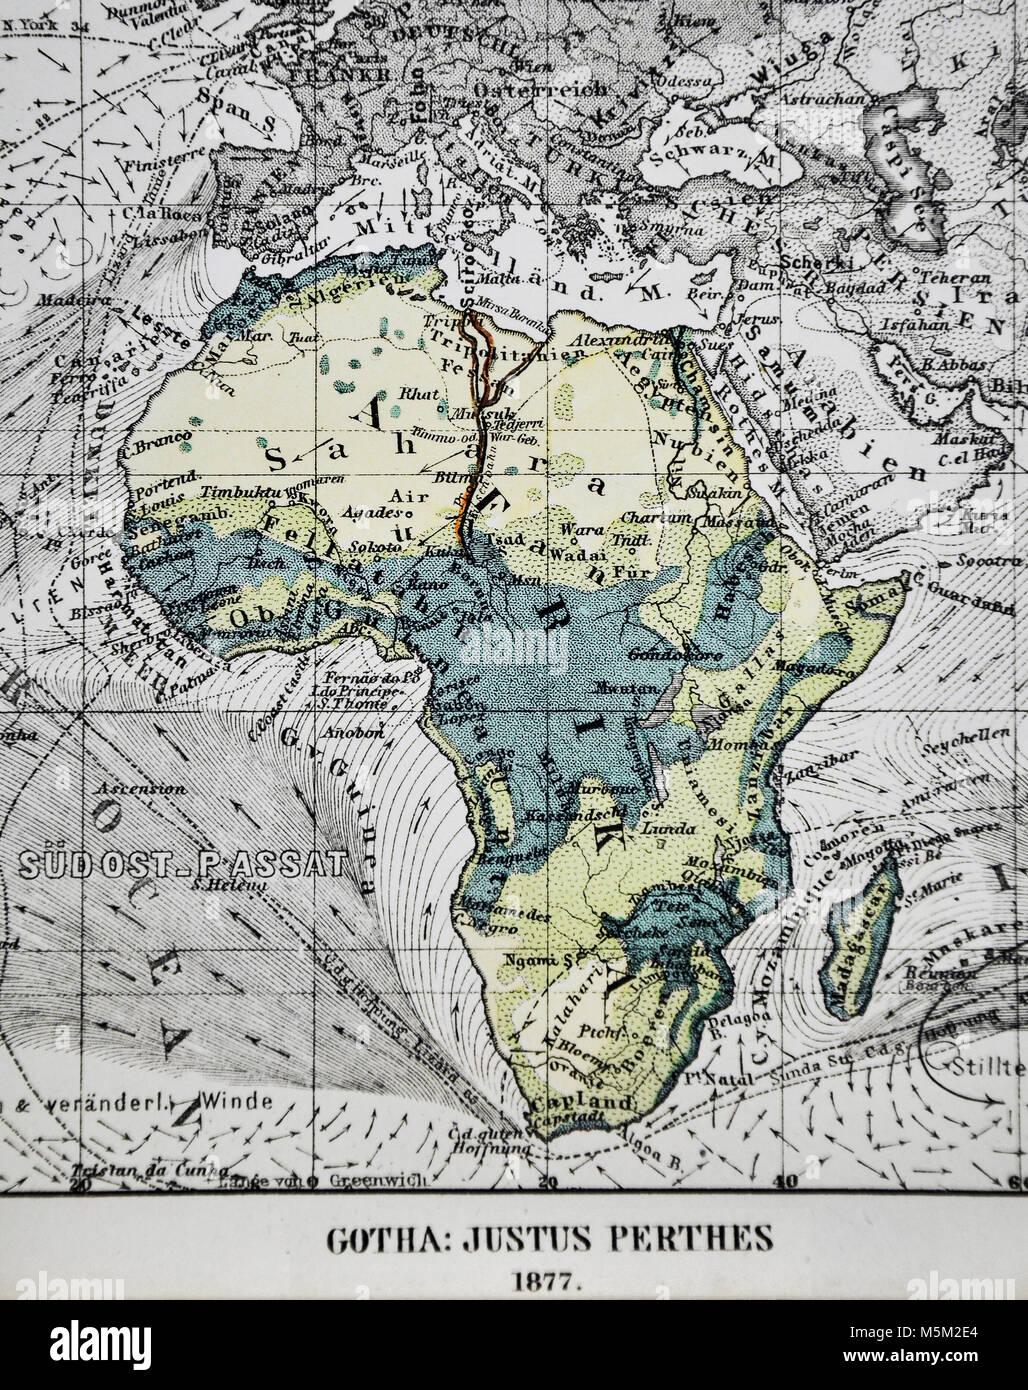 1877 Petermann Mittheilungen Physical Map of Africa showing Ocean